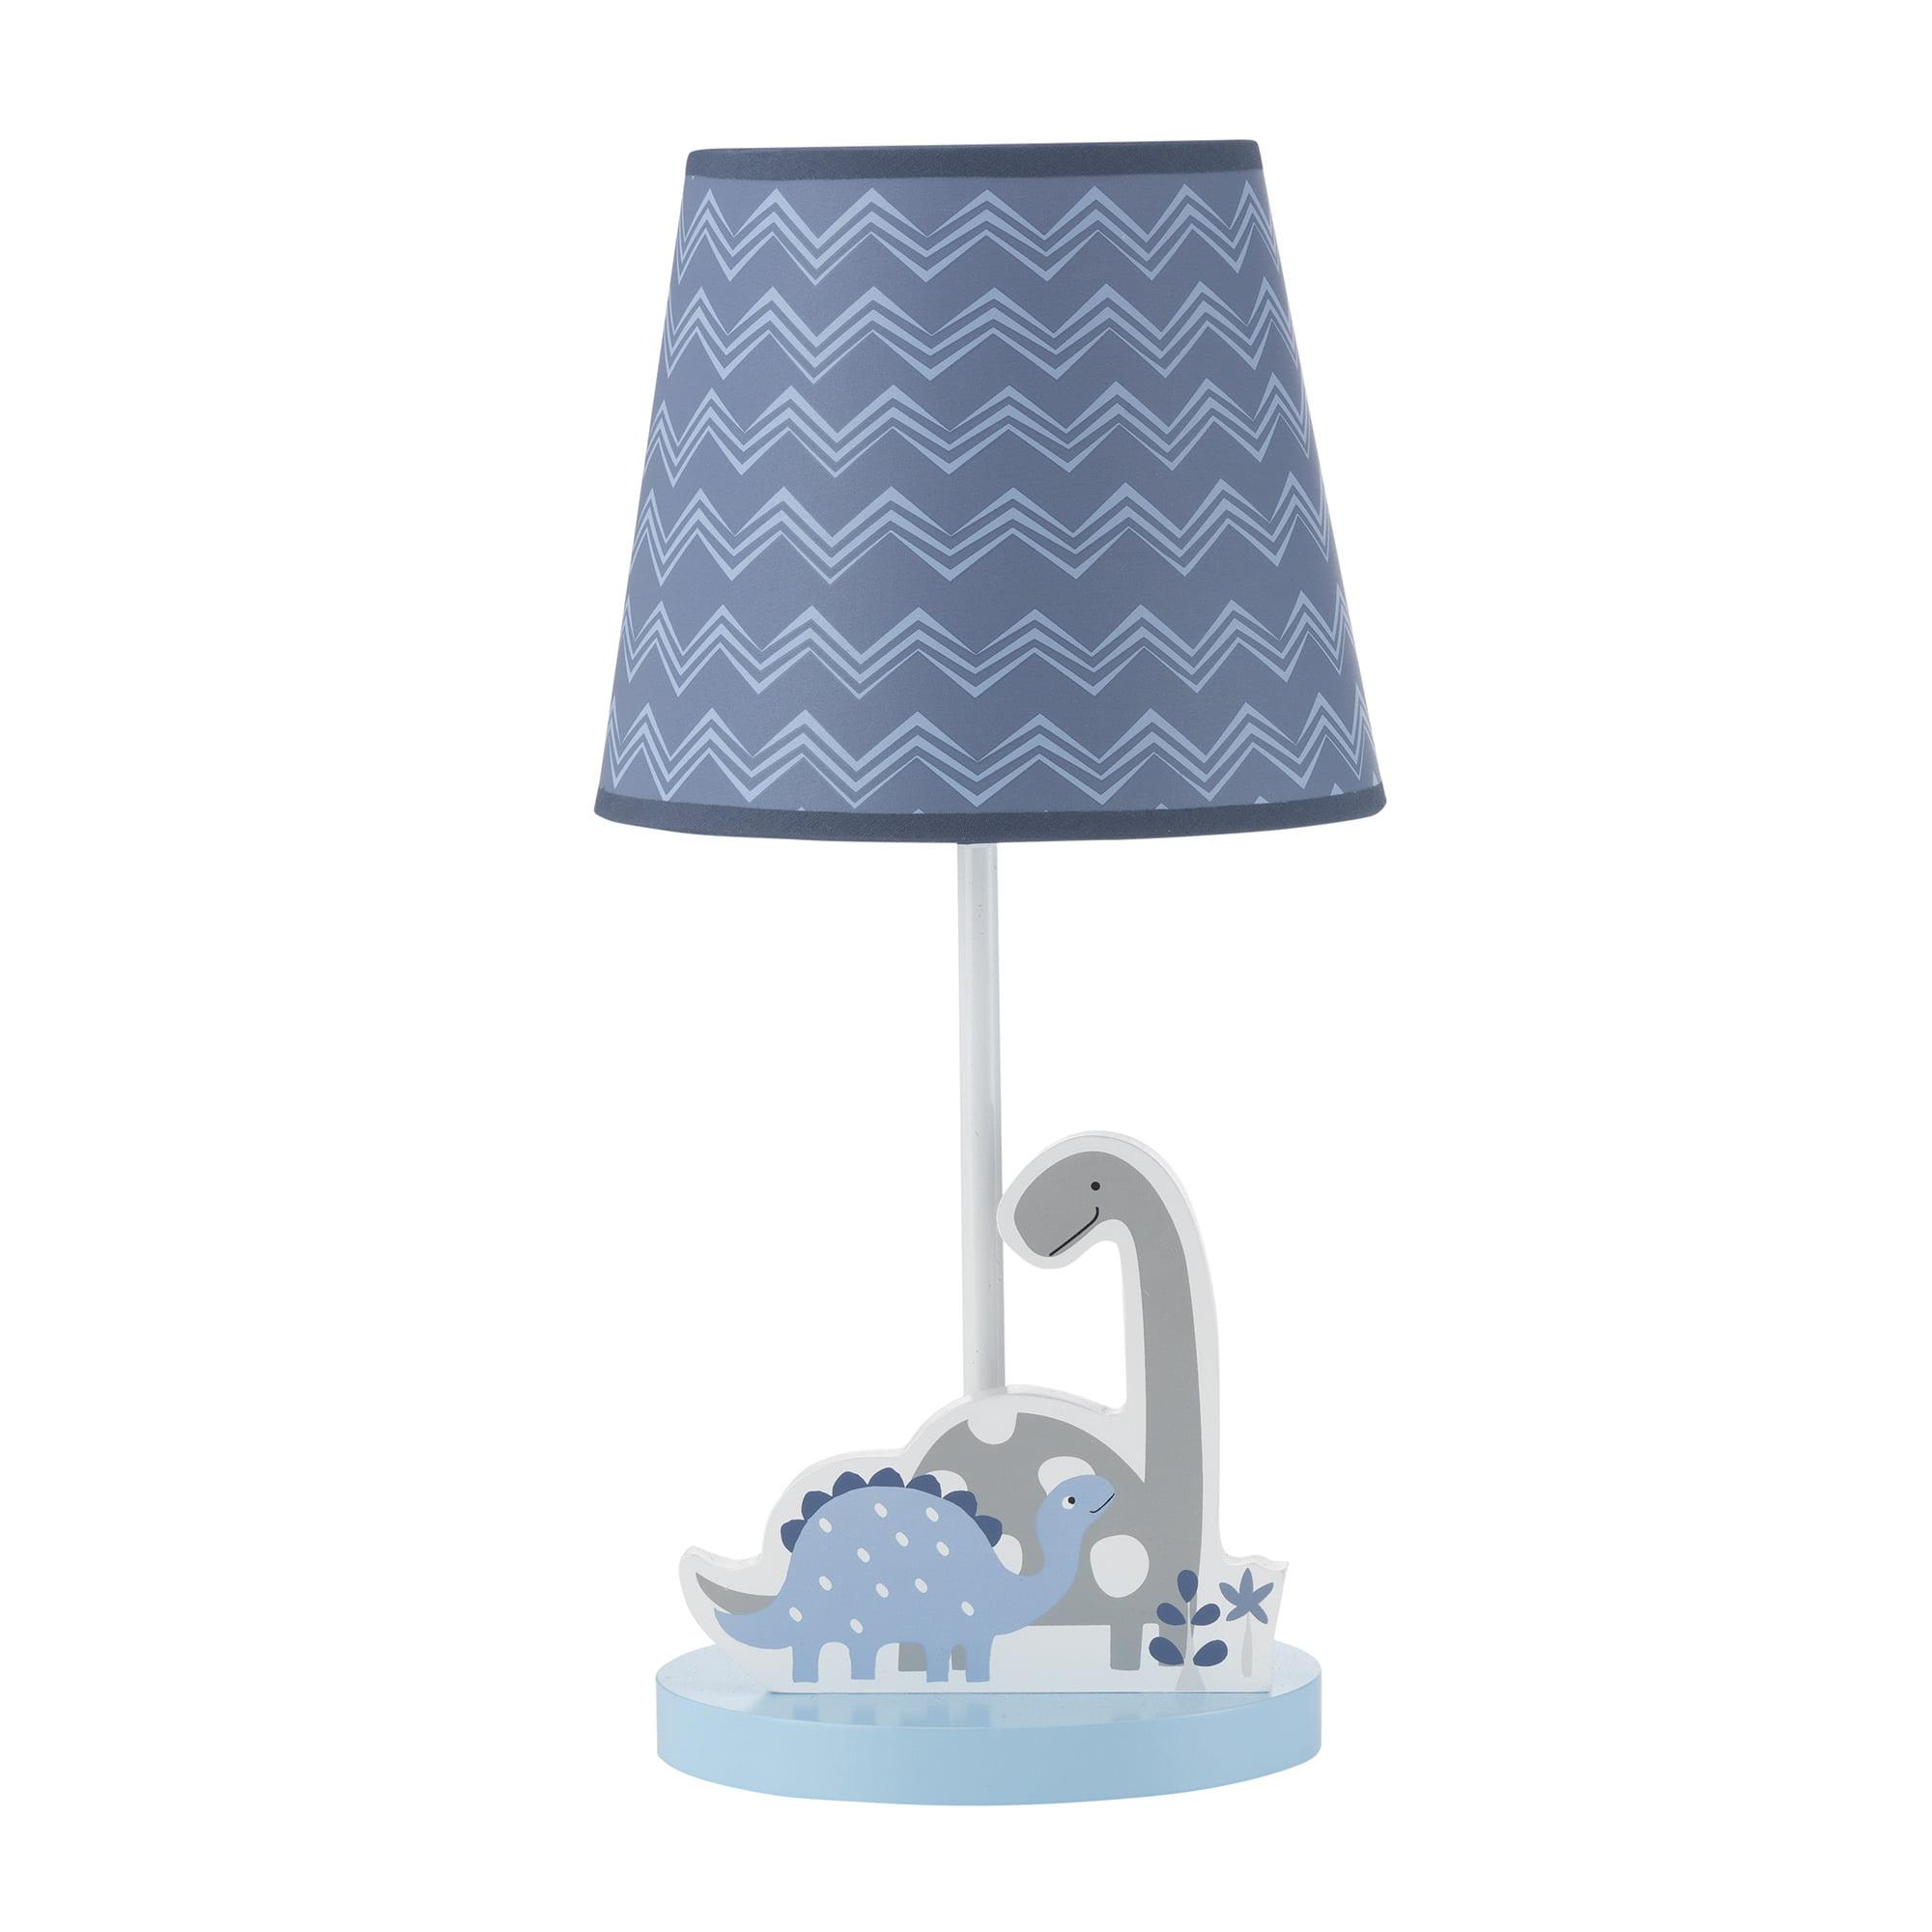 Bedtime Originals ROAR Dinosaur Lamp with Shade & Bulb by Bedtime Originals